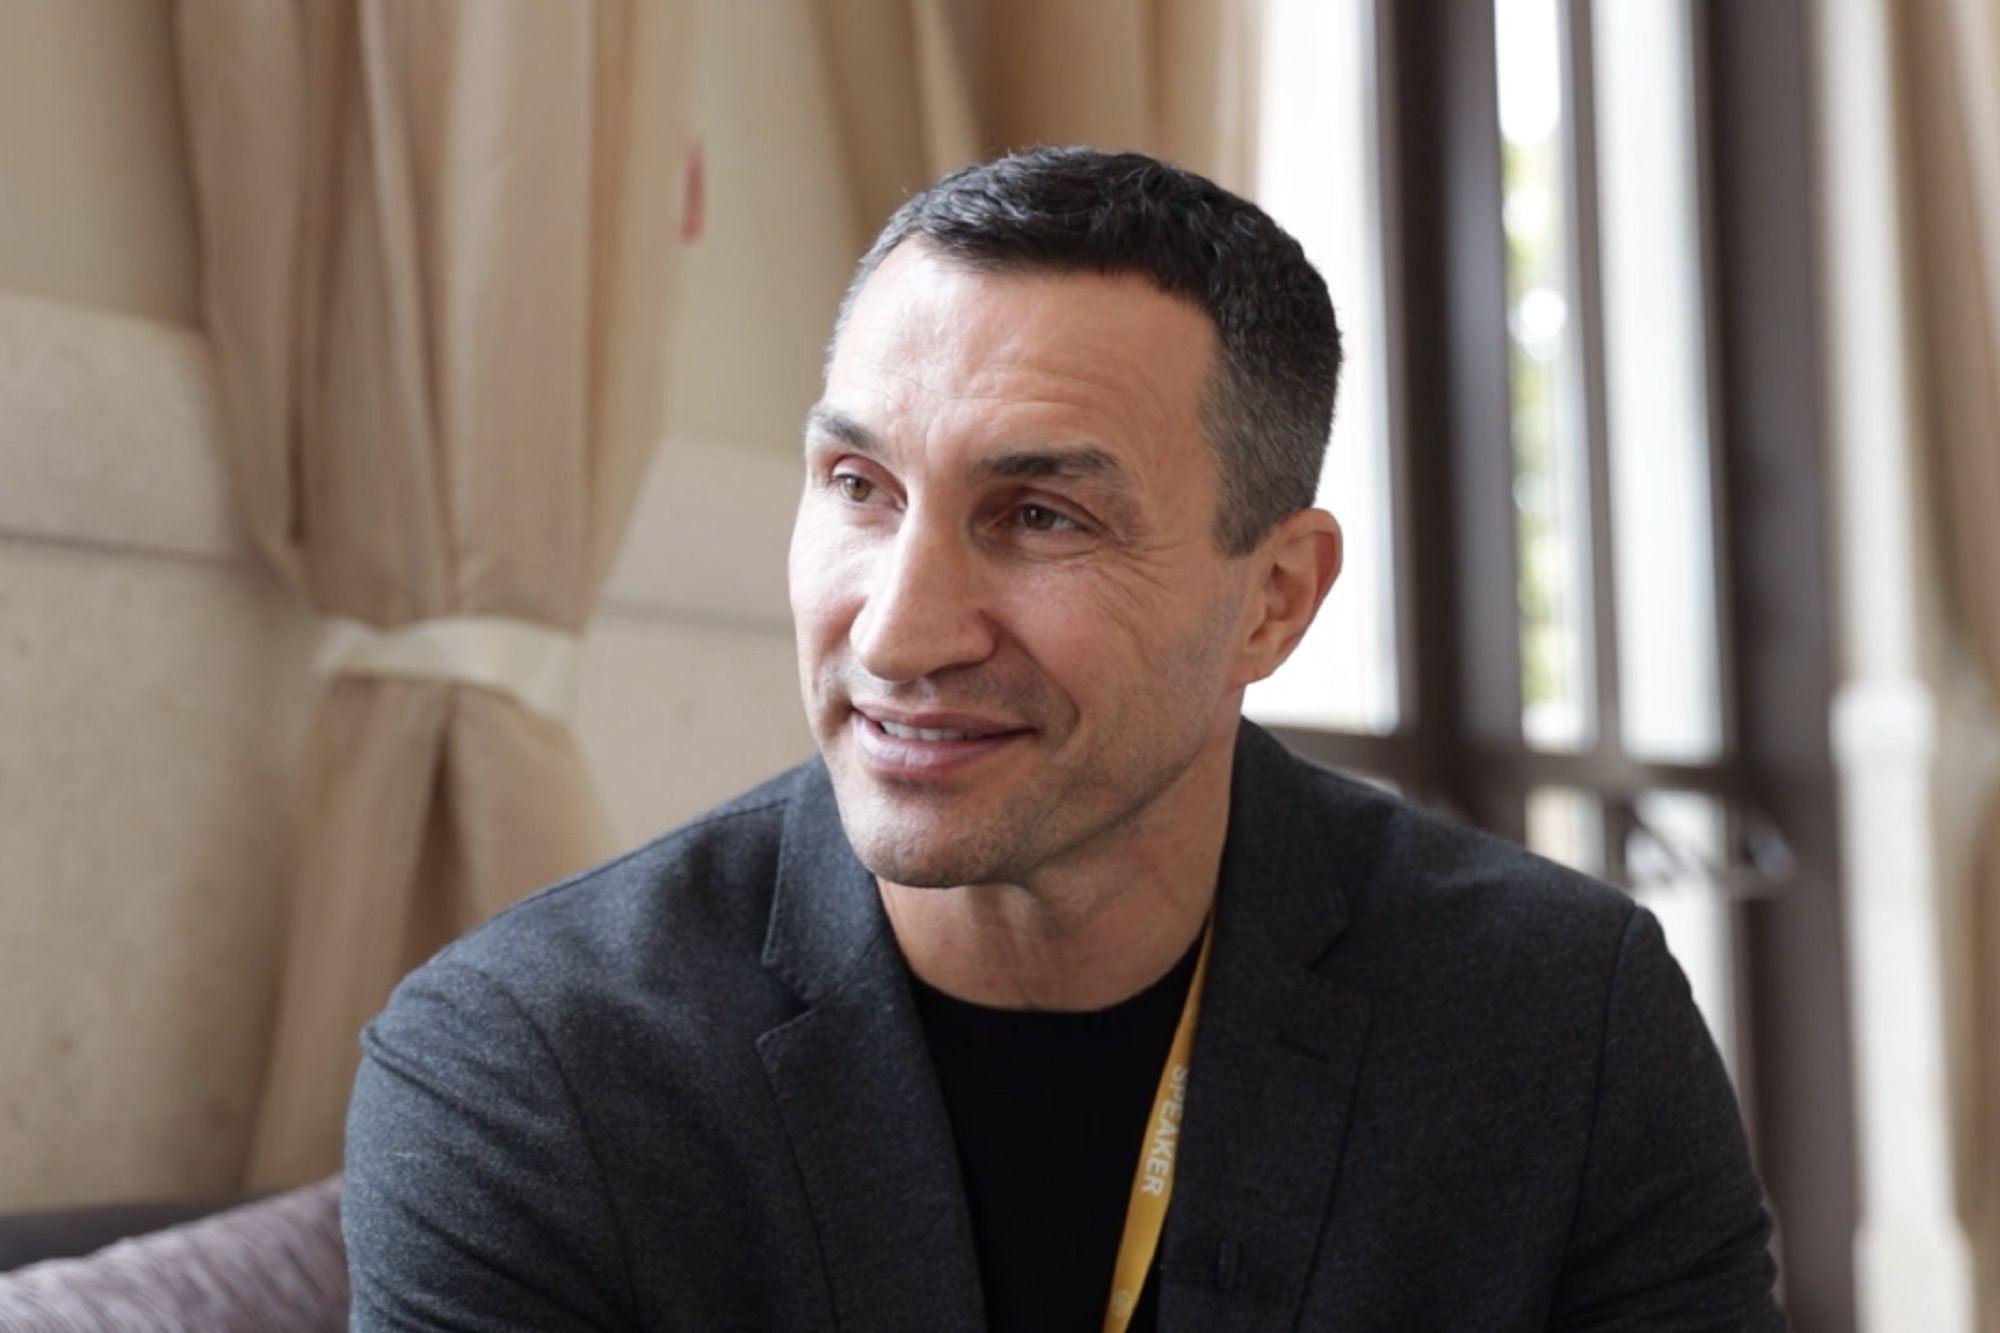 Longest Reigning Heavyweight Boxing Champion Dr. Wladimir Klitschko On Achieving (And Maintaining) Peak Performance